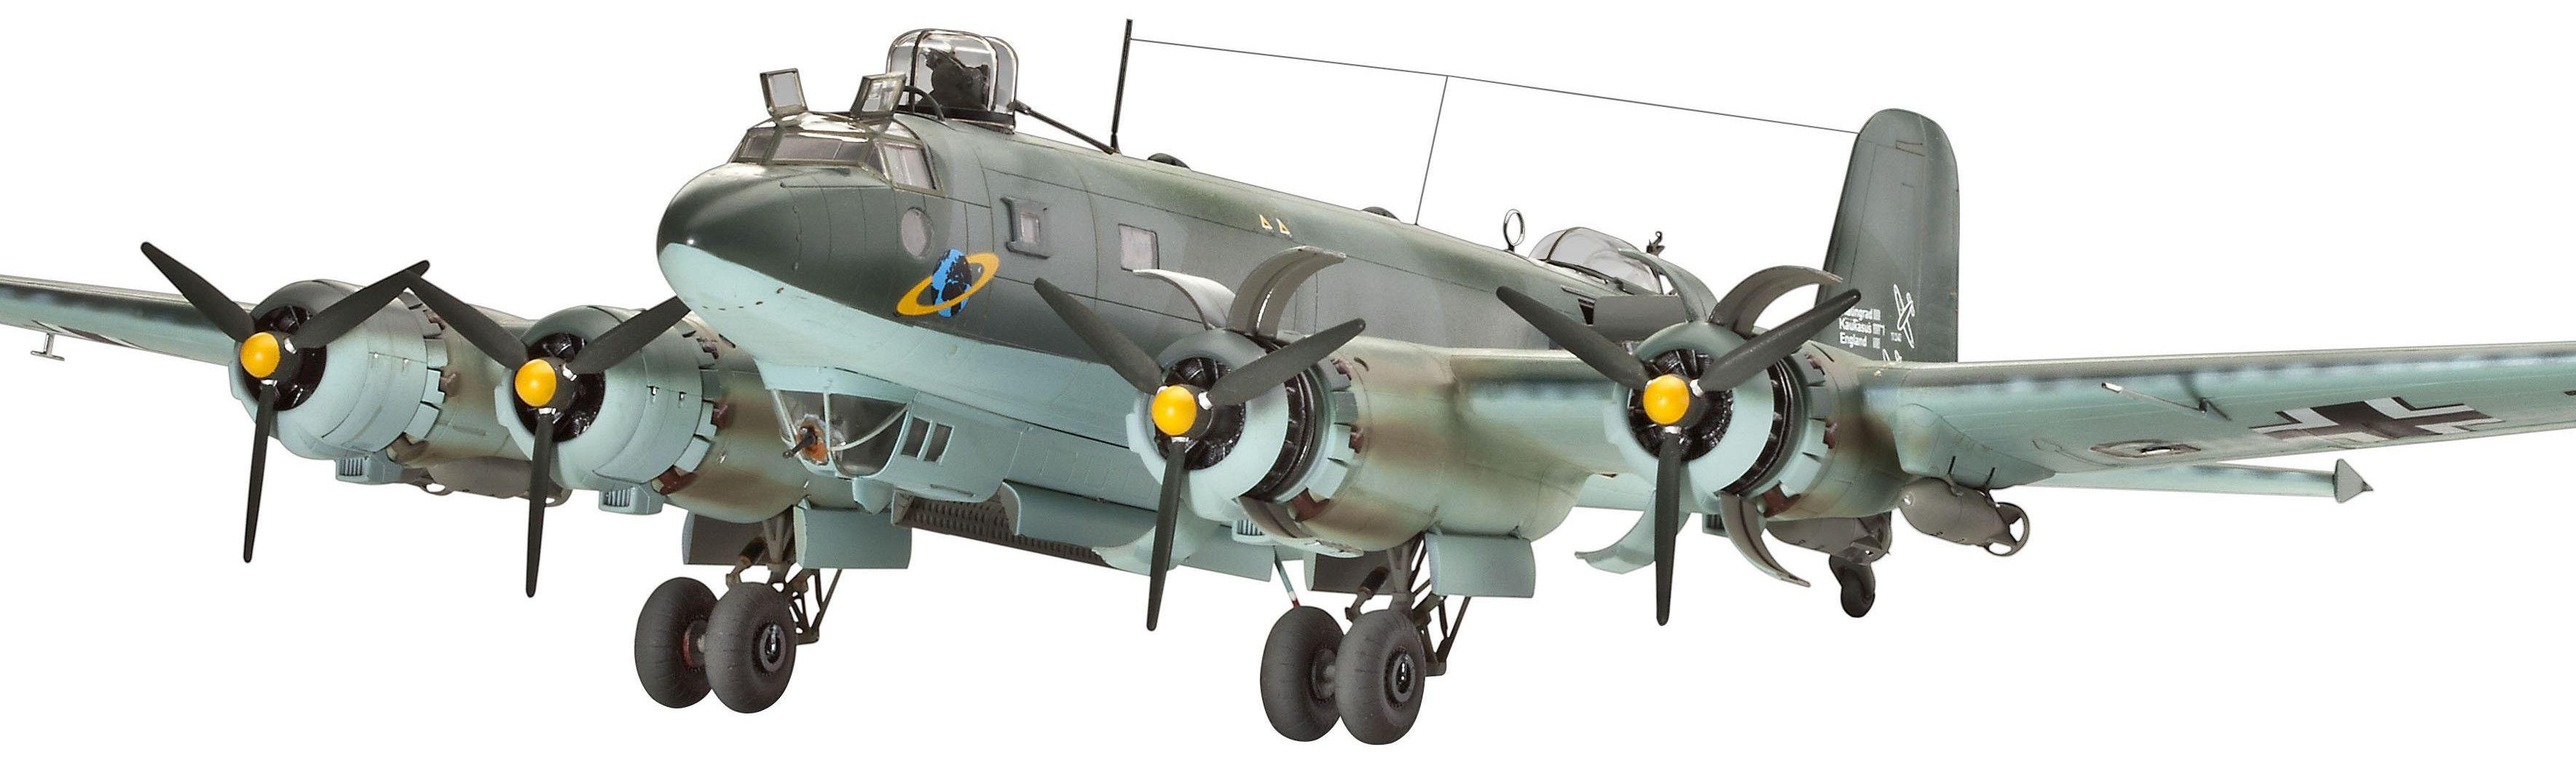 Сглобяем модел на военен самолет Revell Focke Wulf - Fw 200 C-4 CONDOR Bomber (04678) - 1